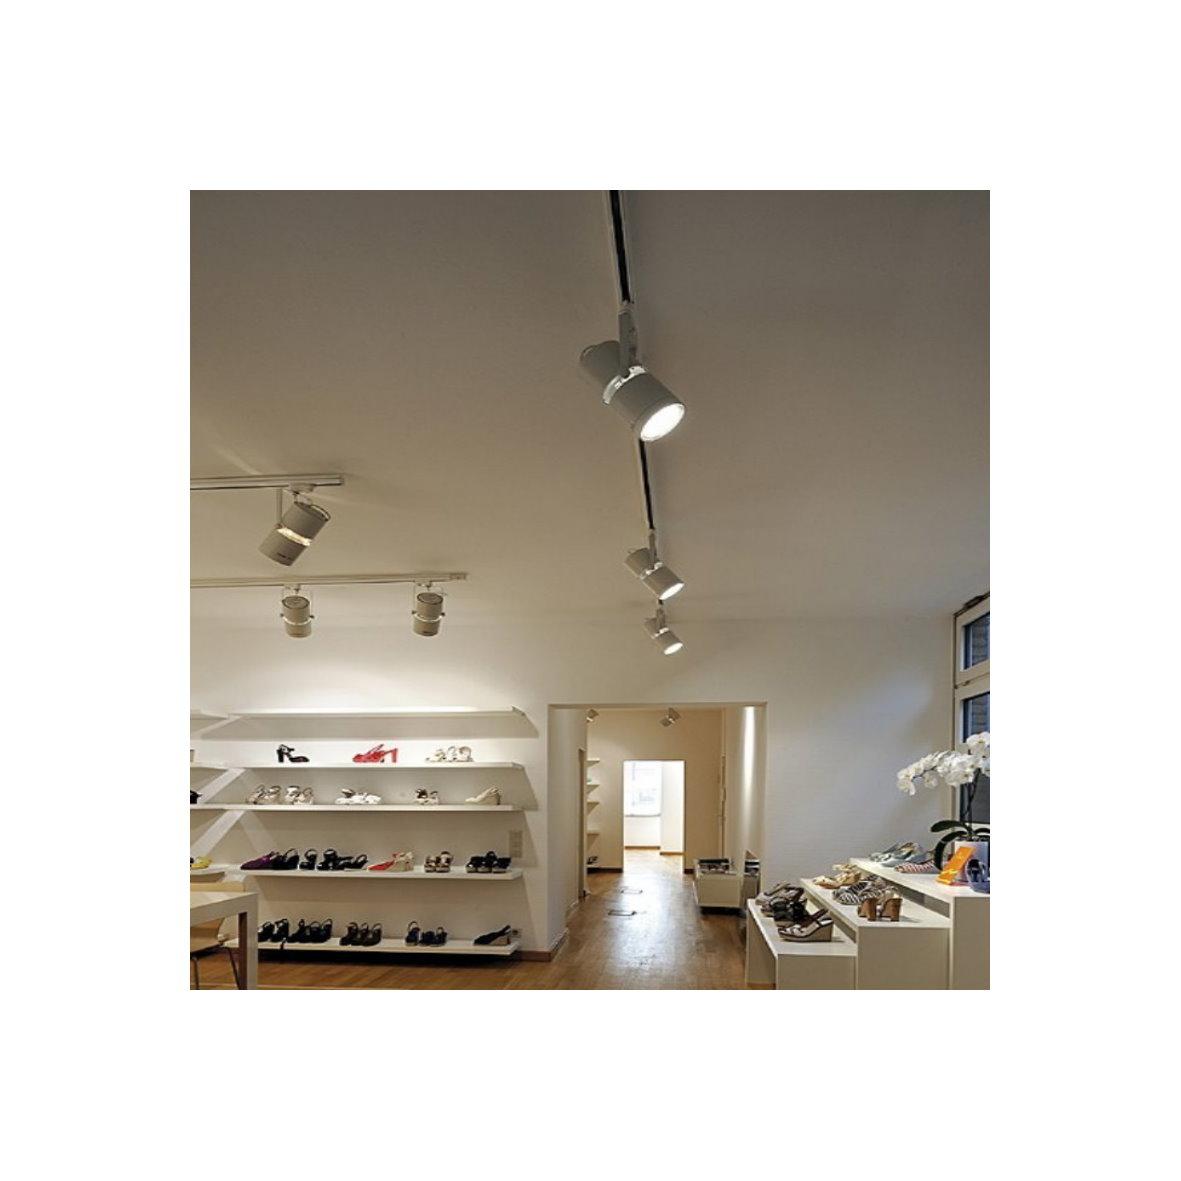 slv led 3 phasen spot strahler leuchte stromschiene. Black Bedroom Furniture Sets. Home Design Ideas